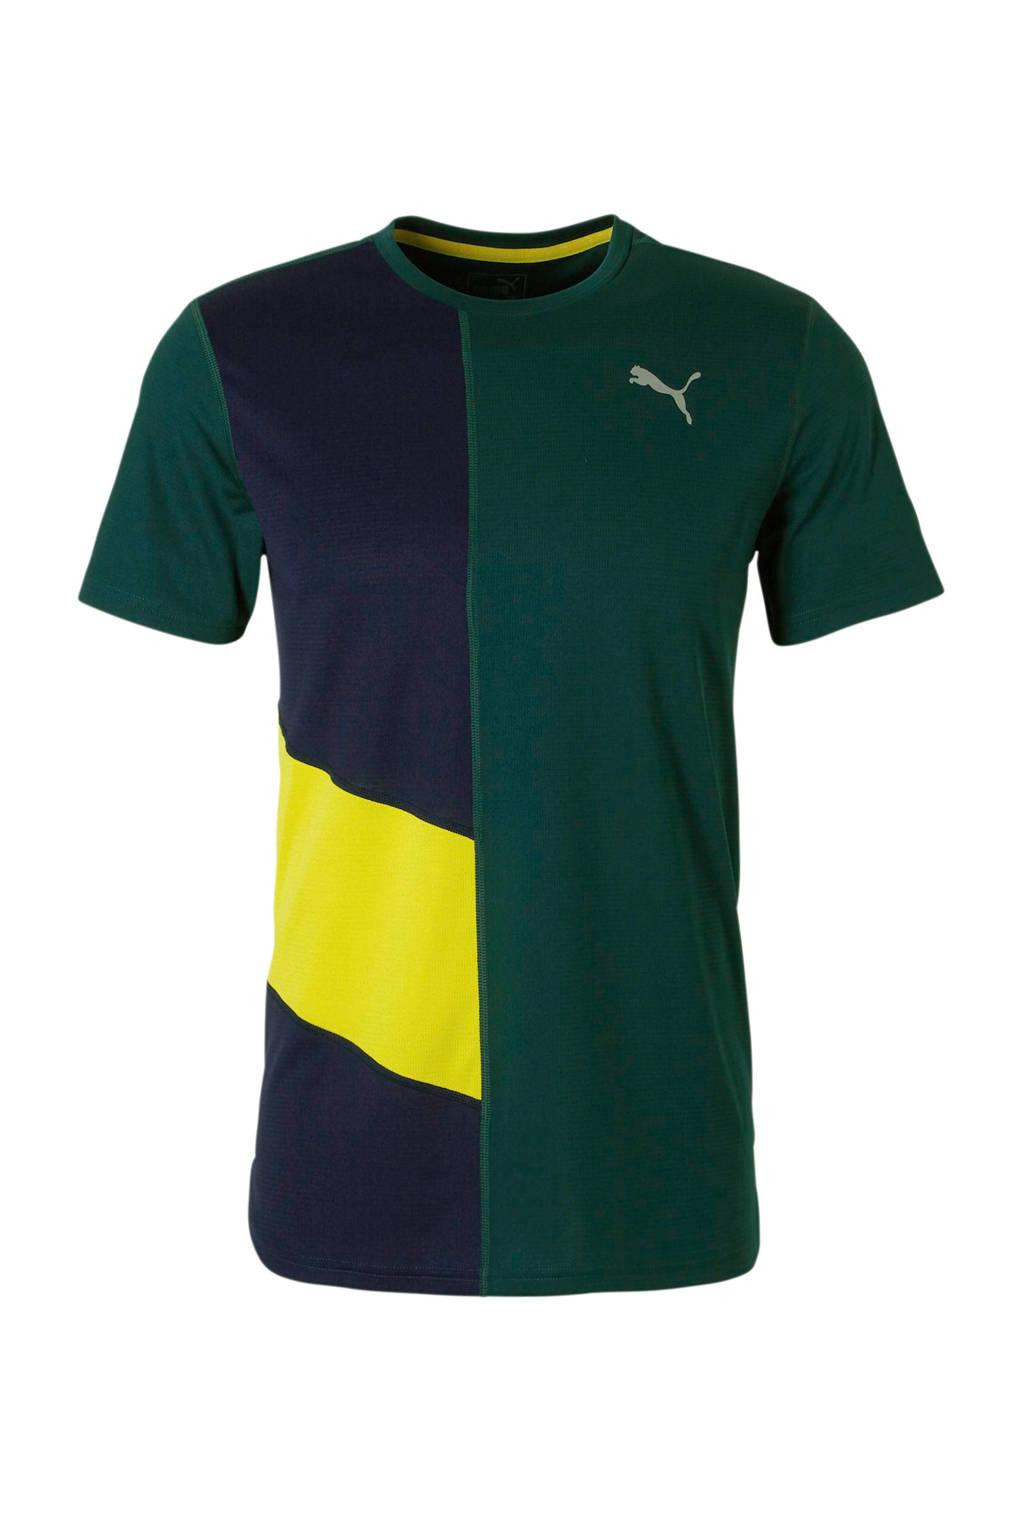 Puma   hardloop T-shirt donkergroen, Donkergroen/geel/donkerblauw